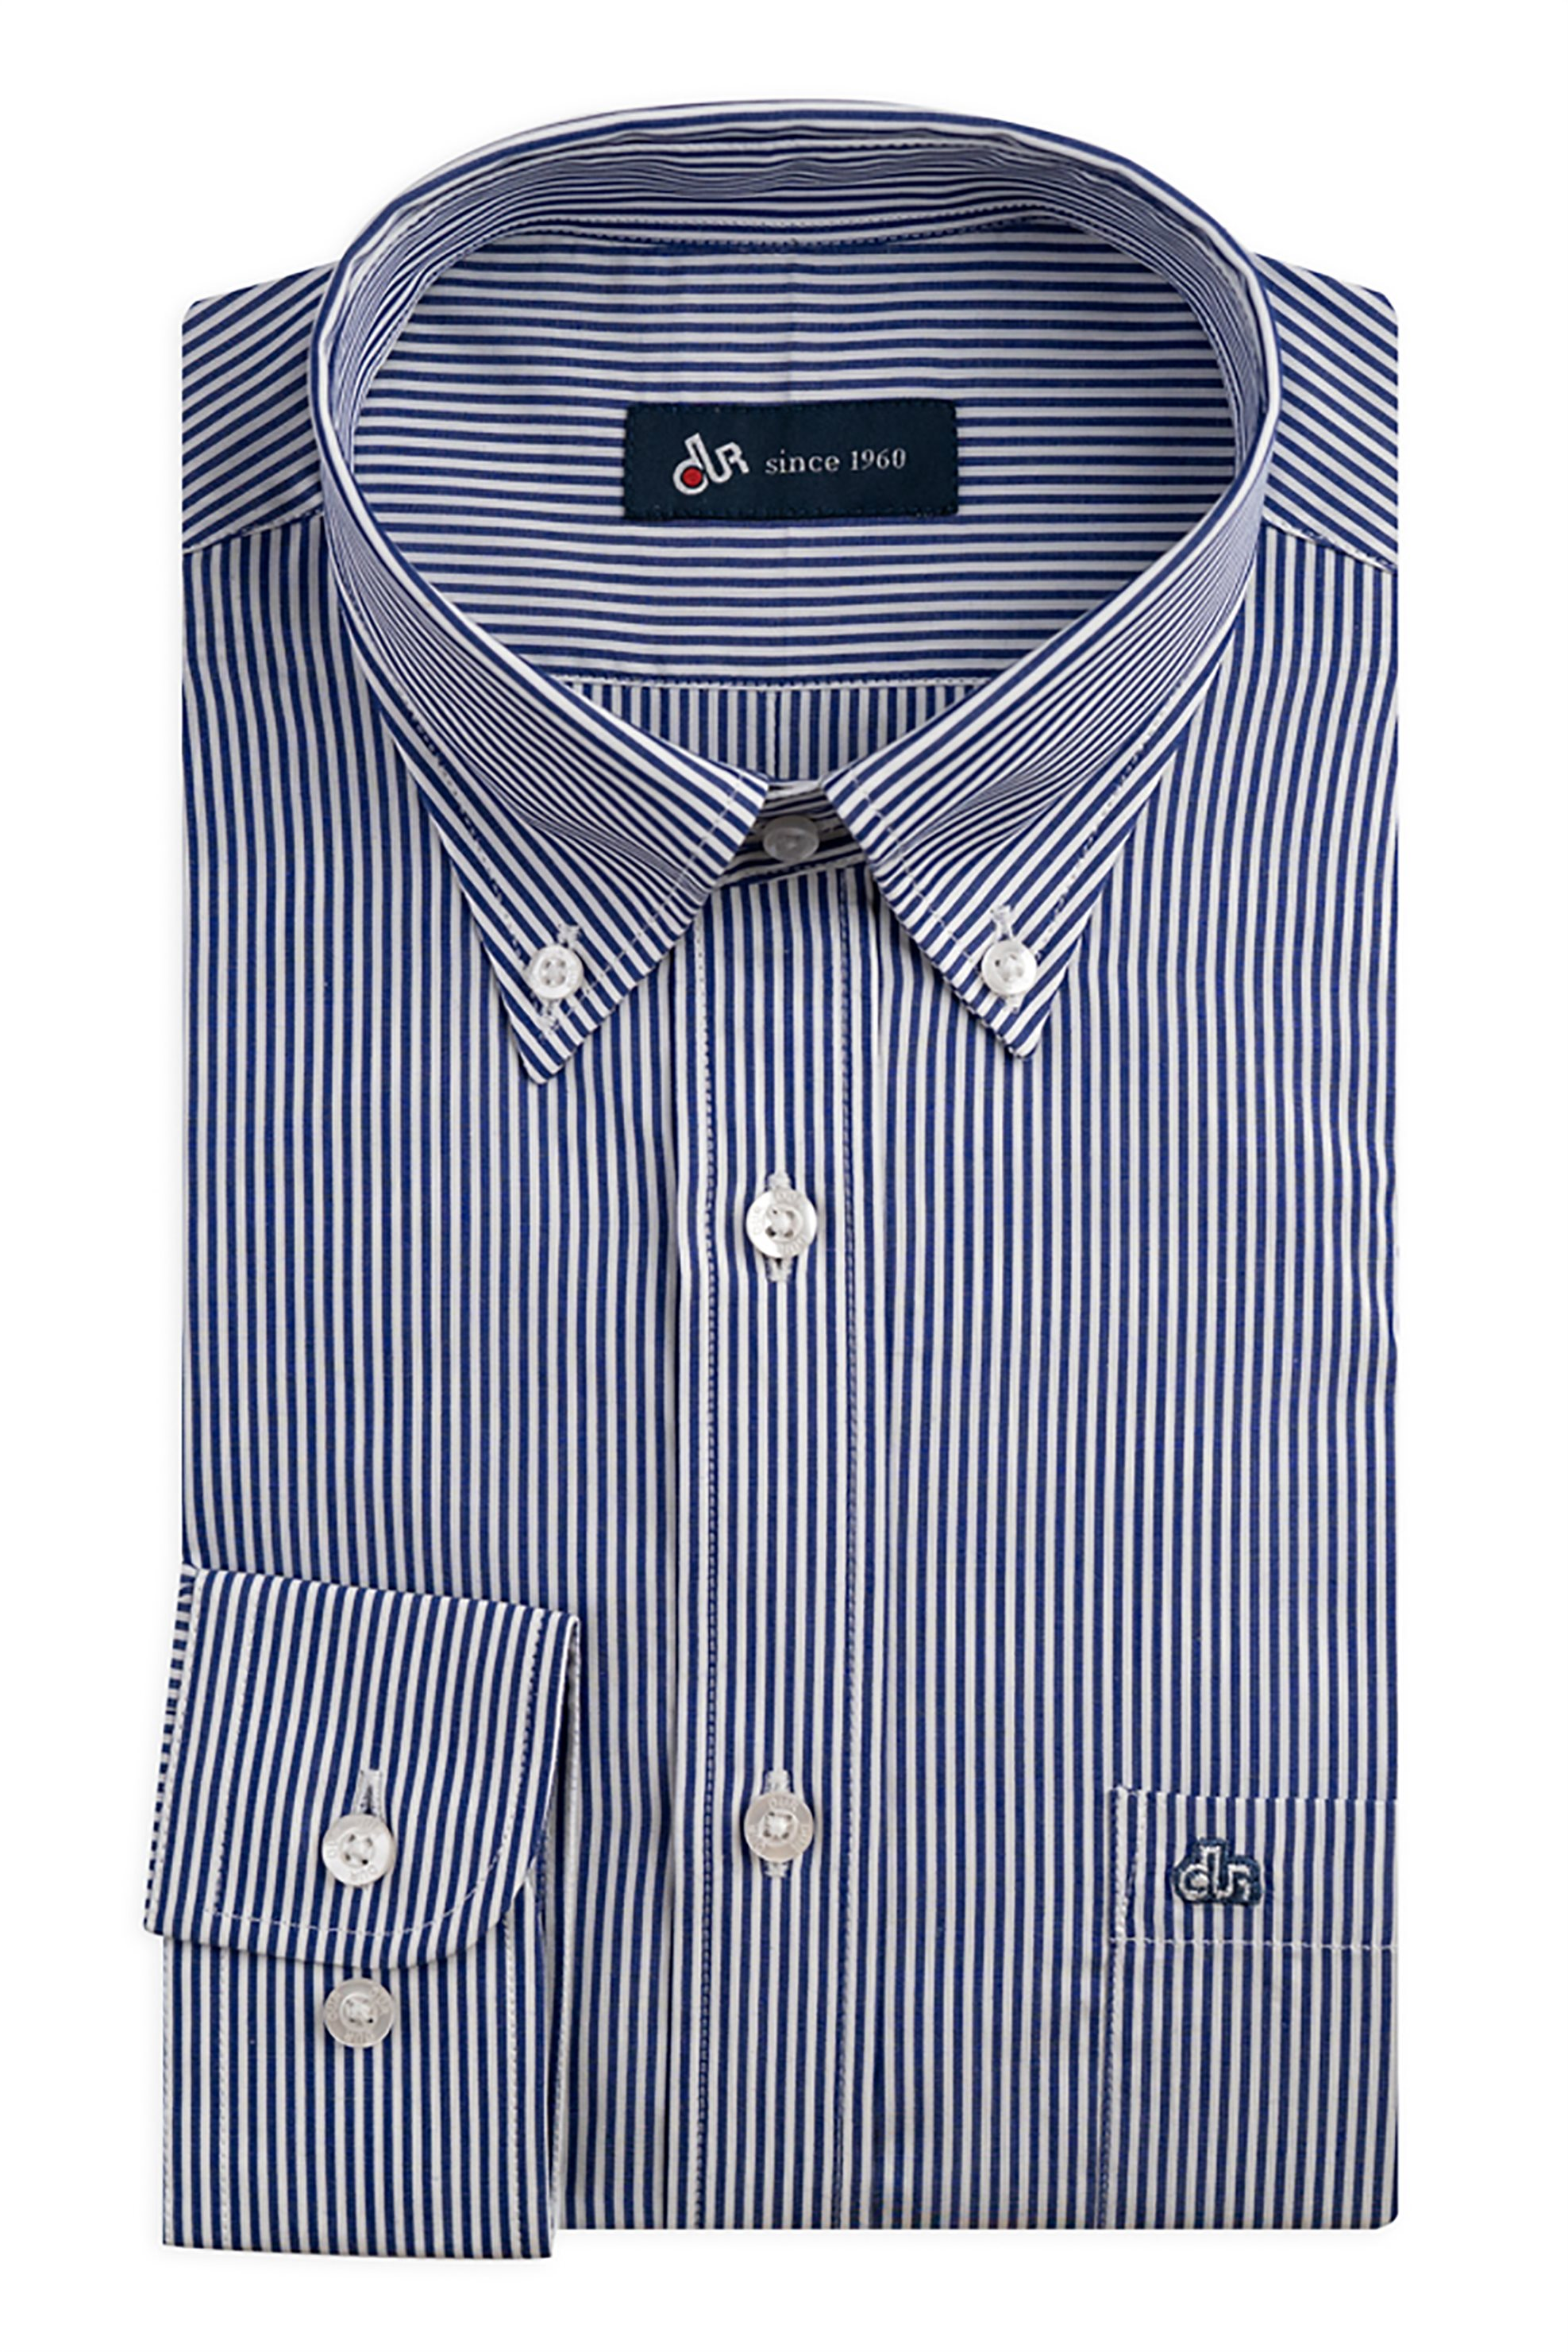 Dur ανδρικό ριγέ πουκάμισο Regular fit - 10210039 - Μπλε